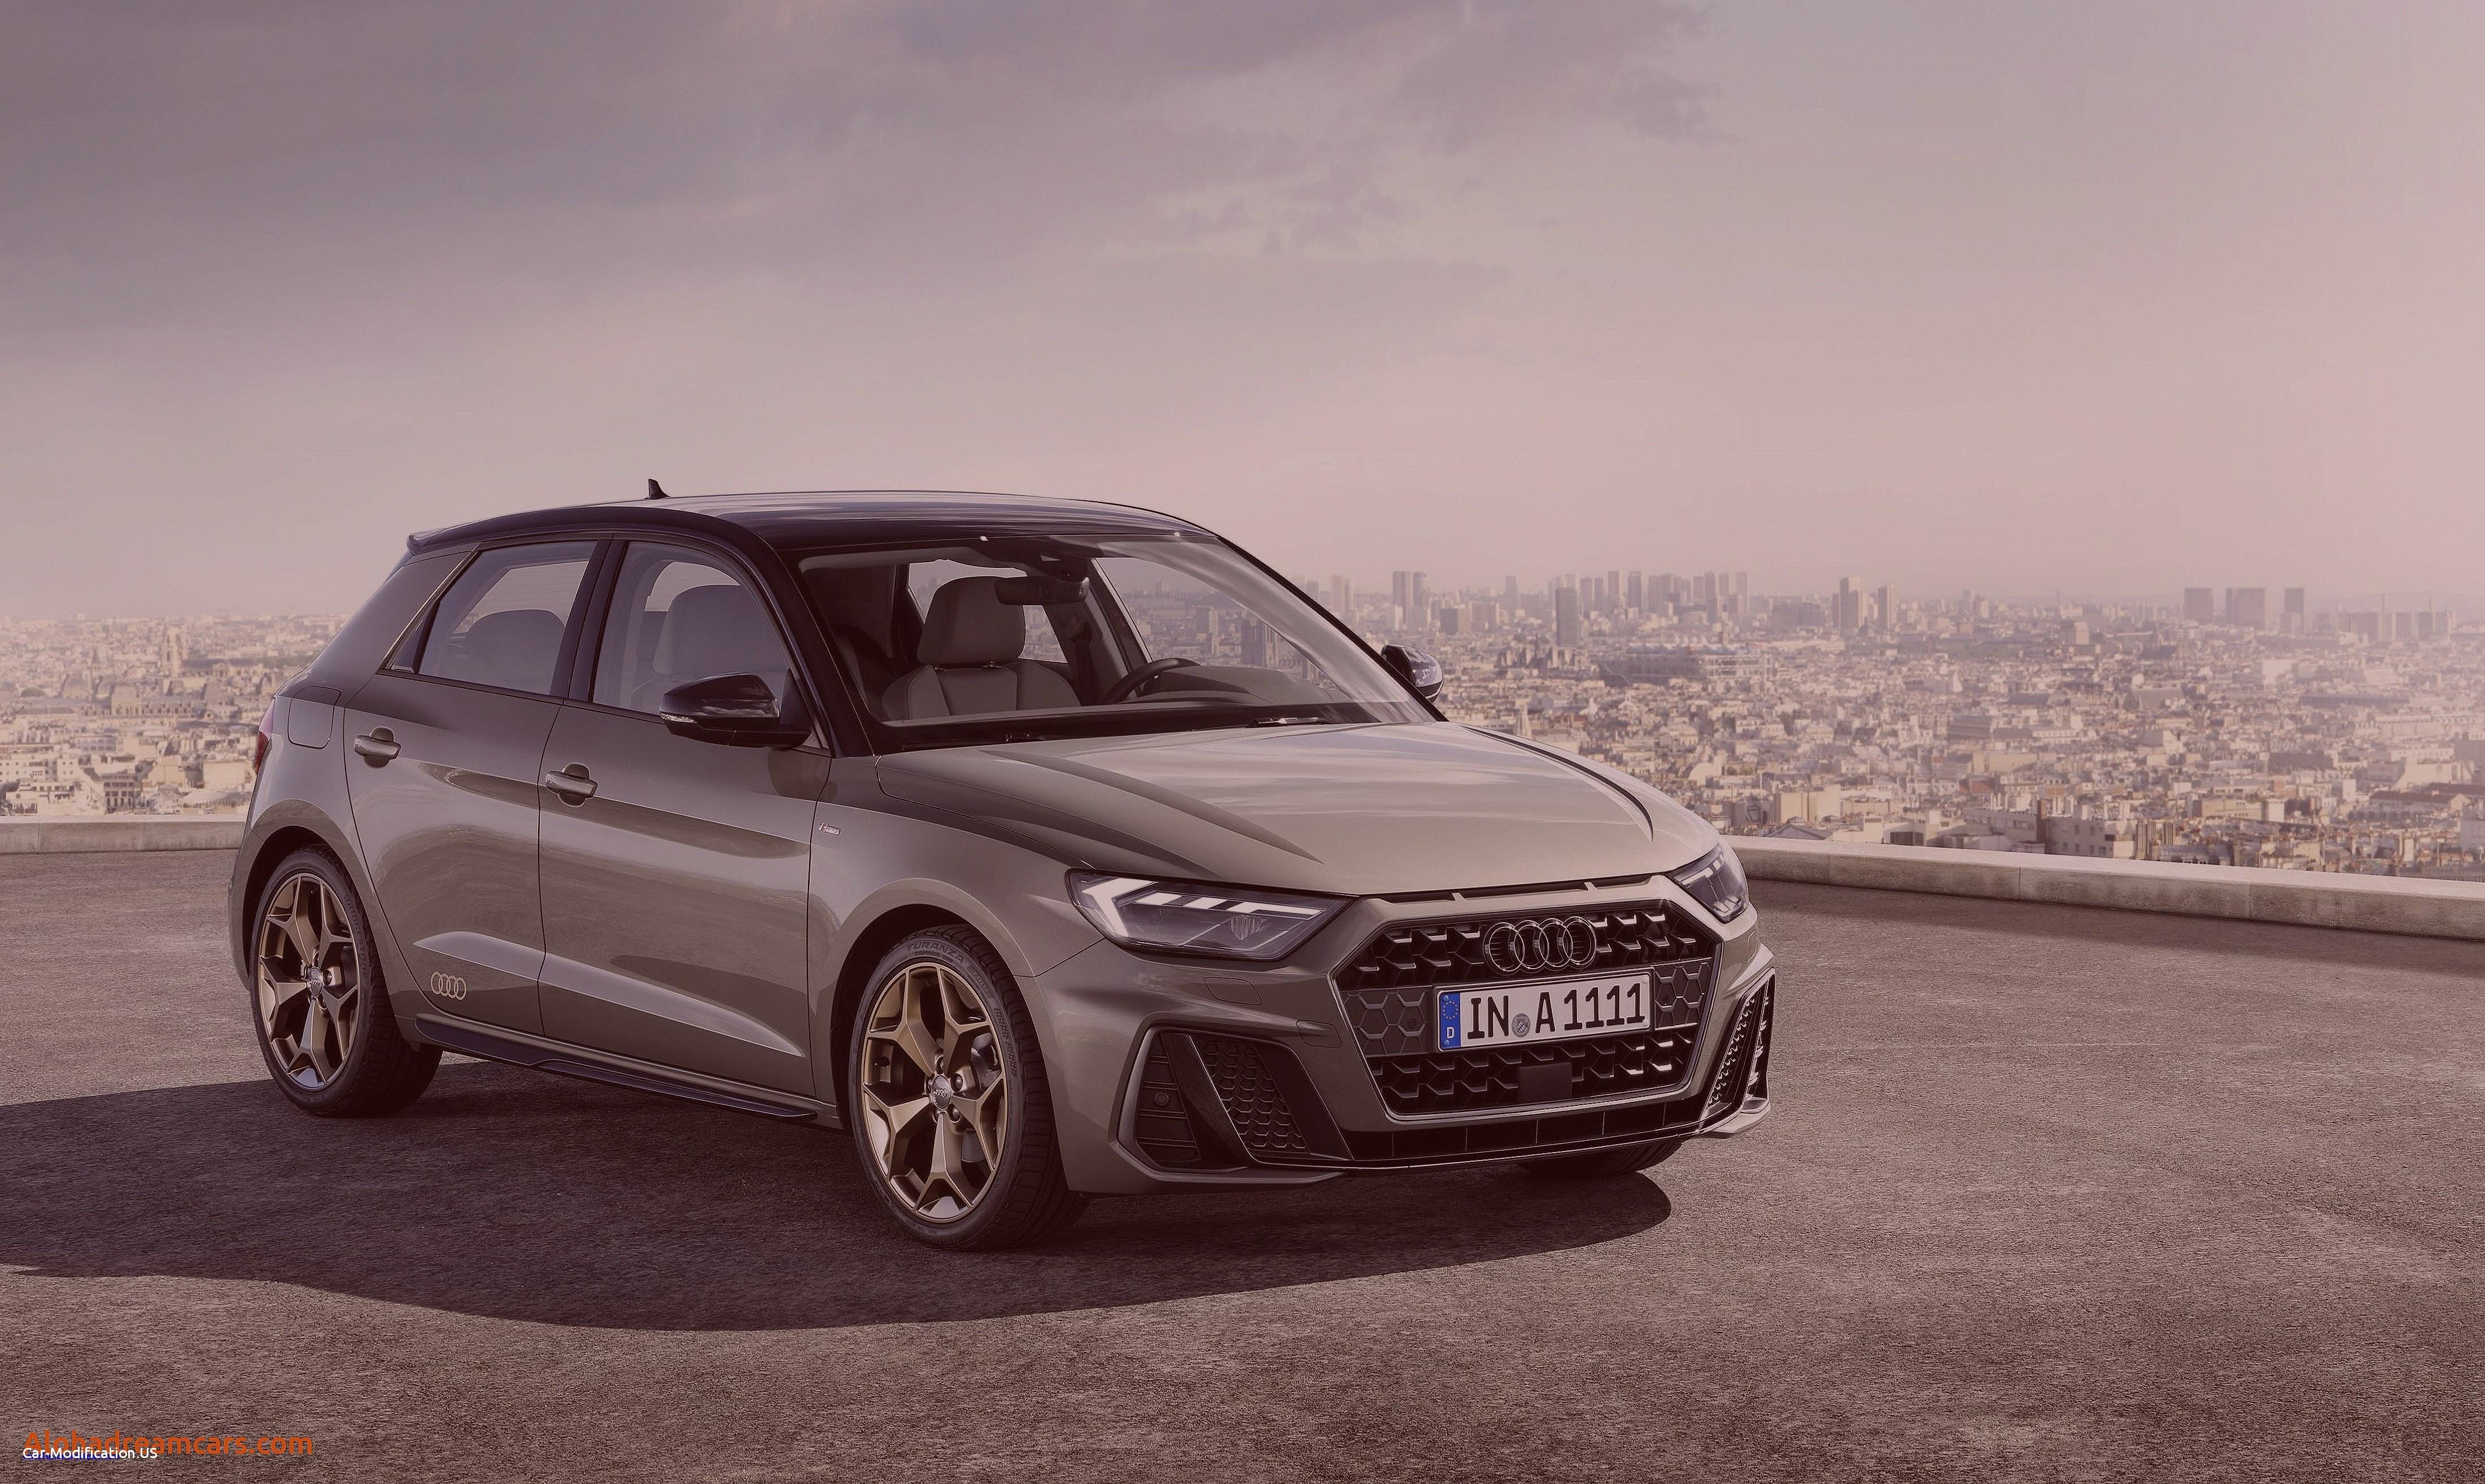 Audi Modified Unique 2019 Audi Tt Audi Car Jokes Autoblogs Club-2343 Of Best Of Audi Modified-2343